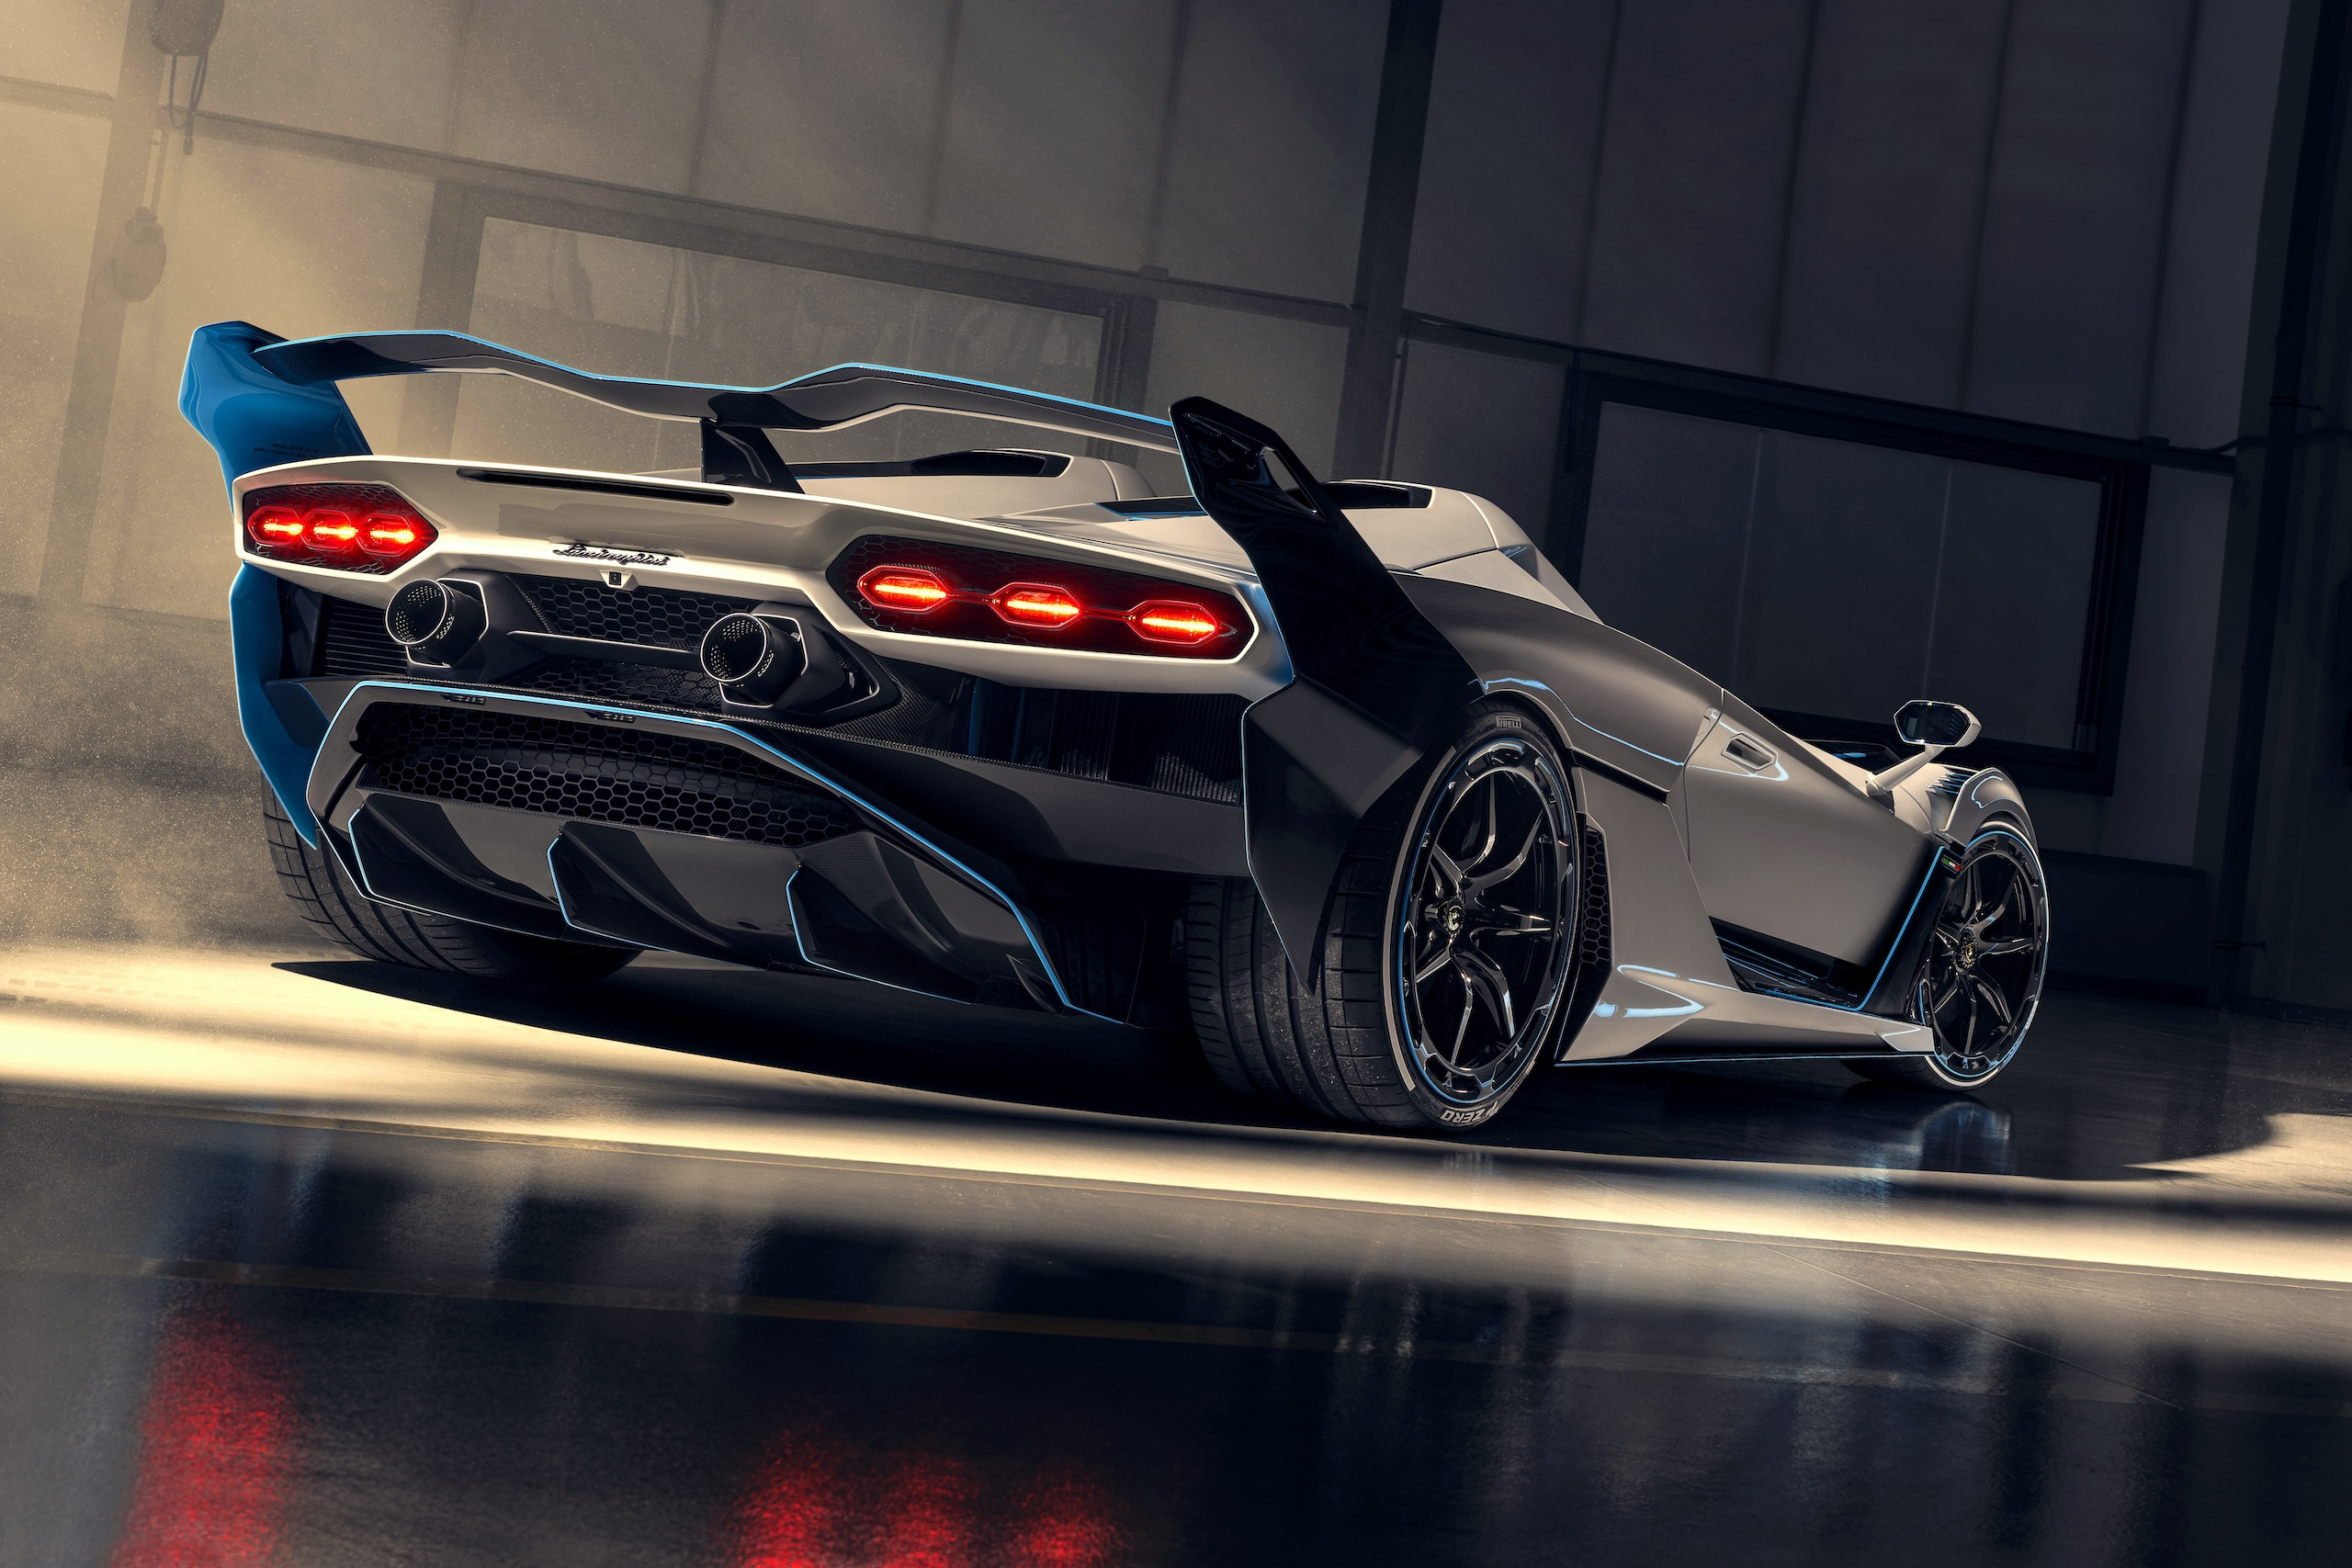 Lamborghini SC20 low rear three quarter